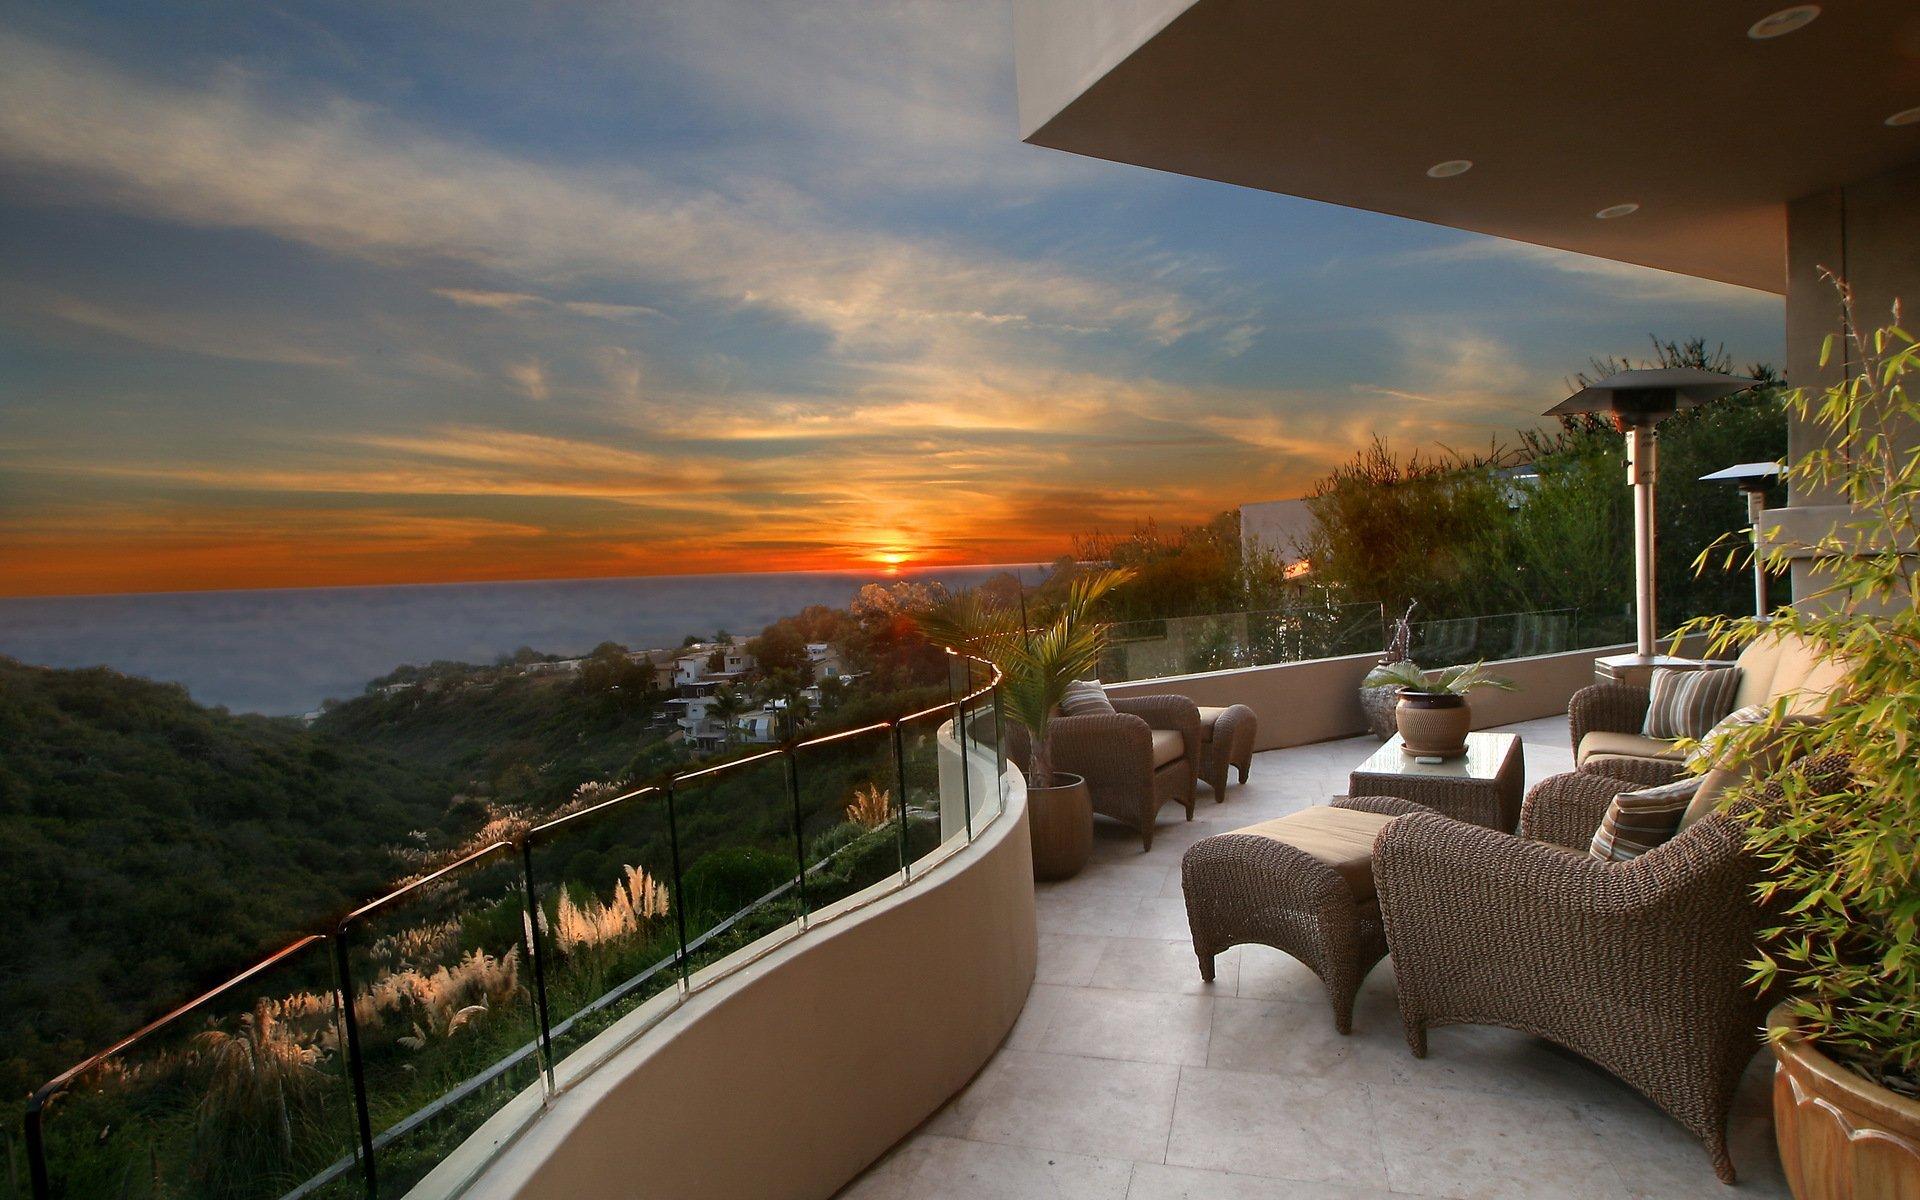 Рассвет закат природа горизорт море балкон интерьер кресла ф.